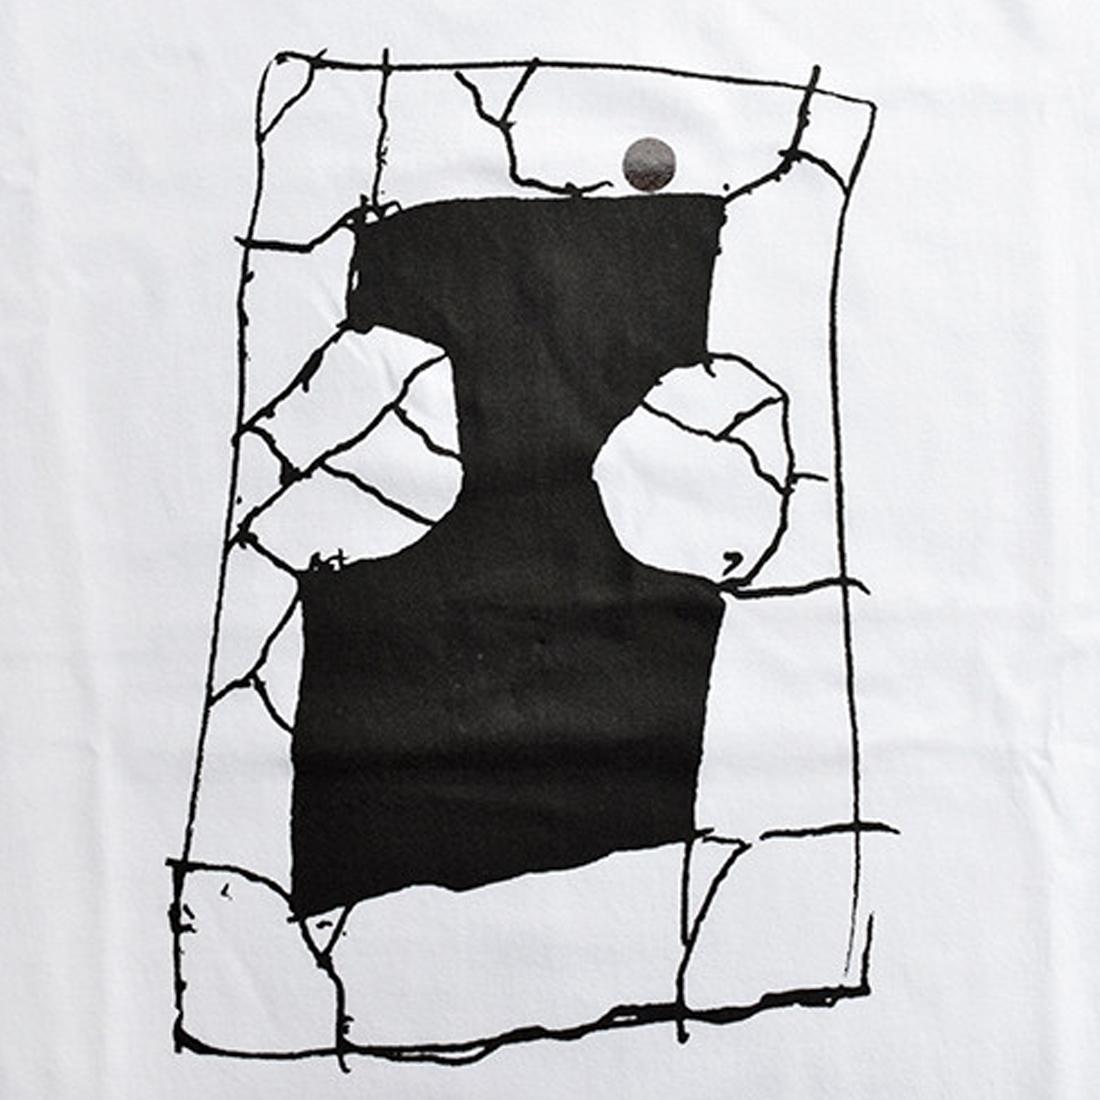 Tシャツ(ヒビT)